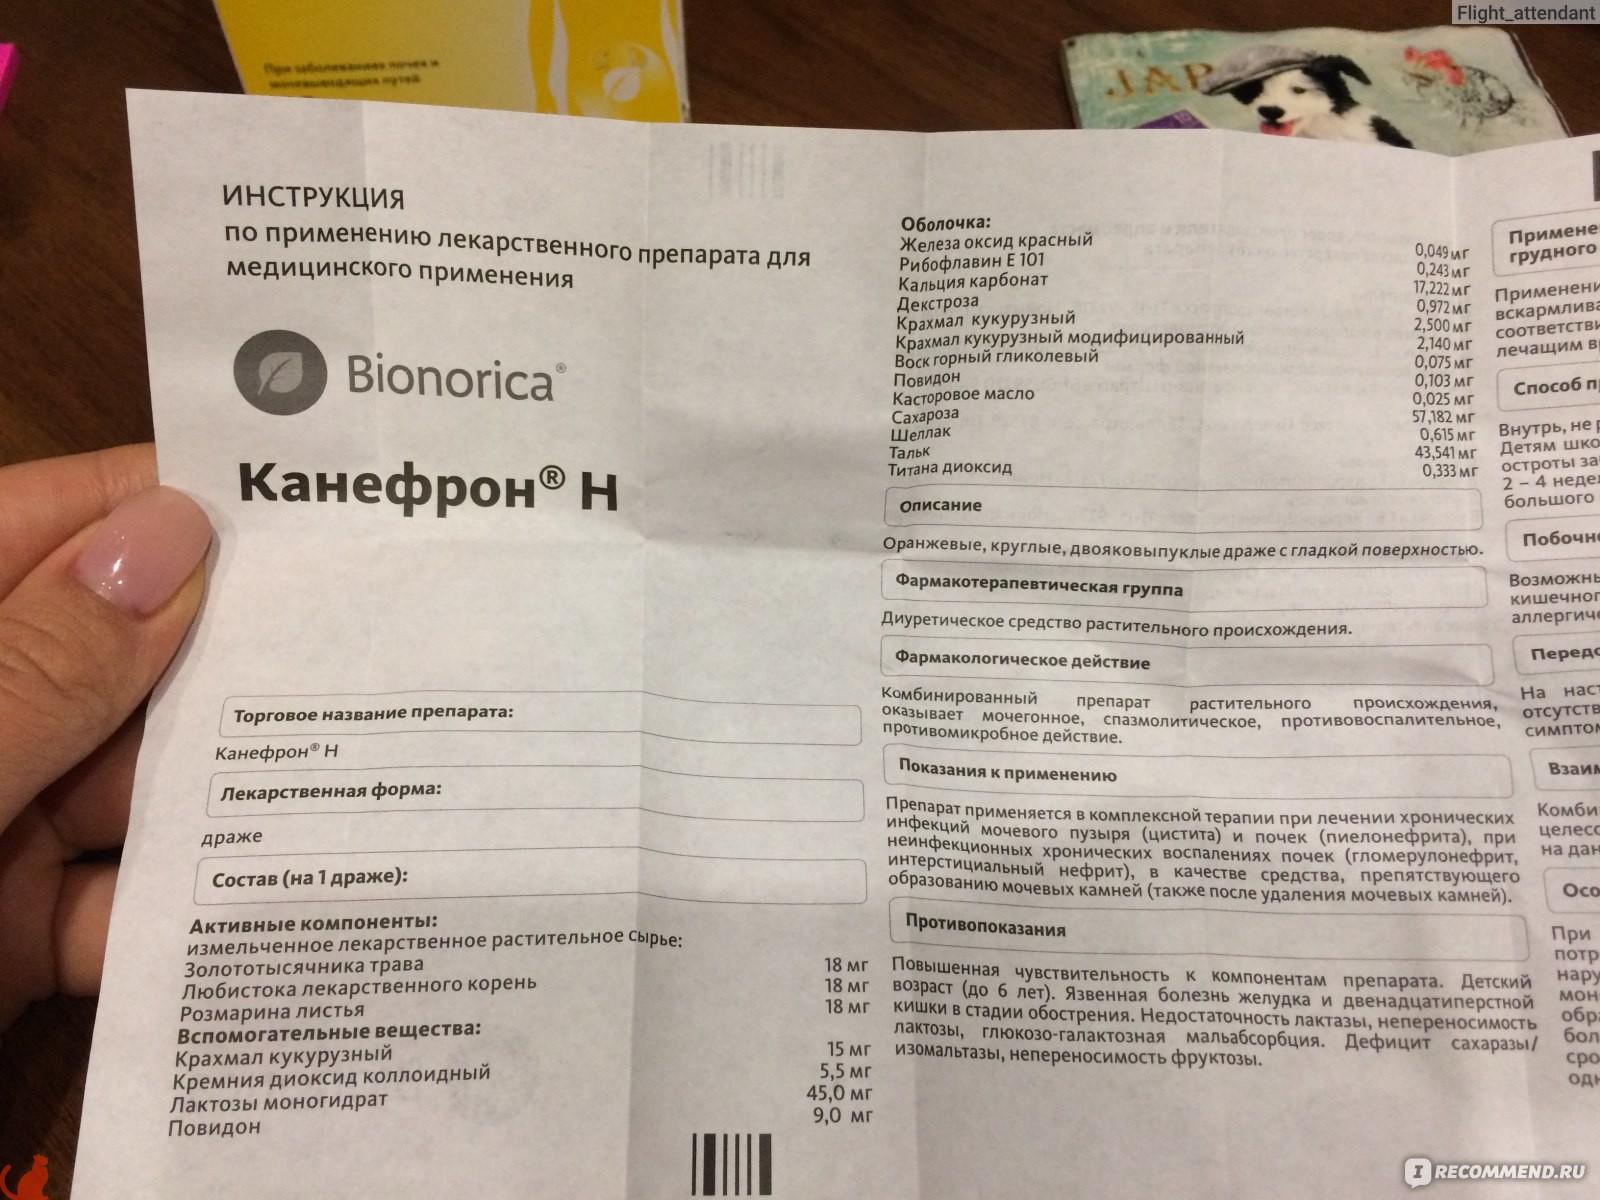 Состав Канефрона